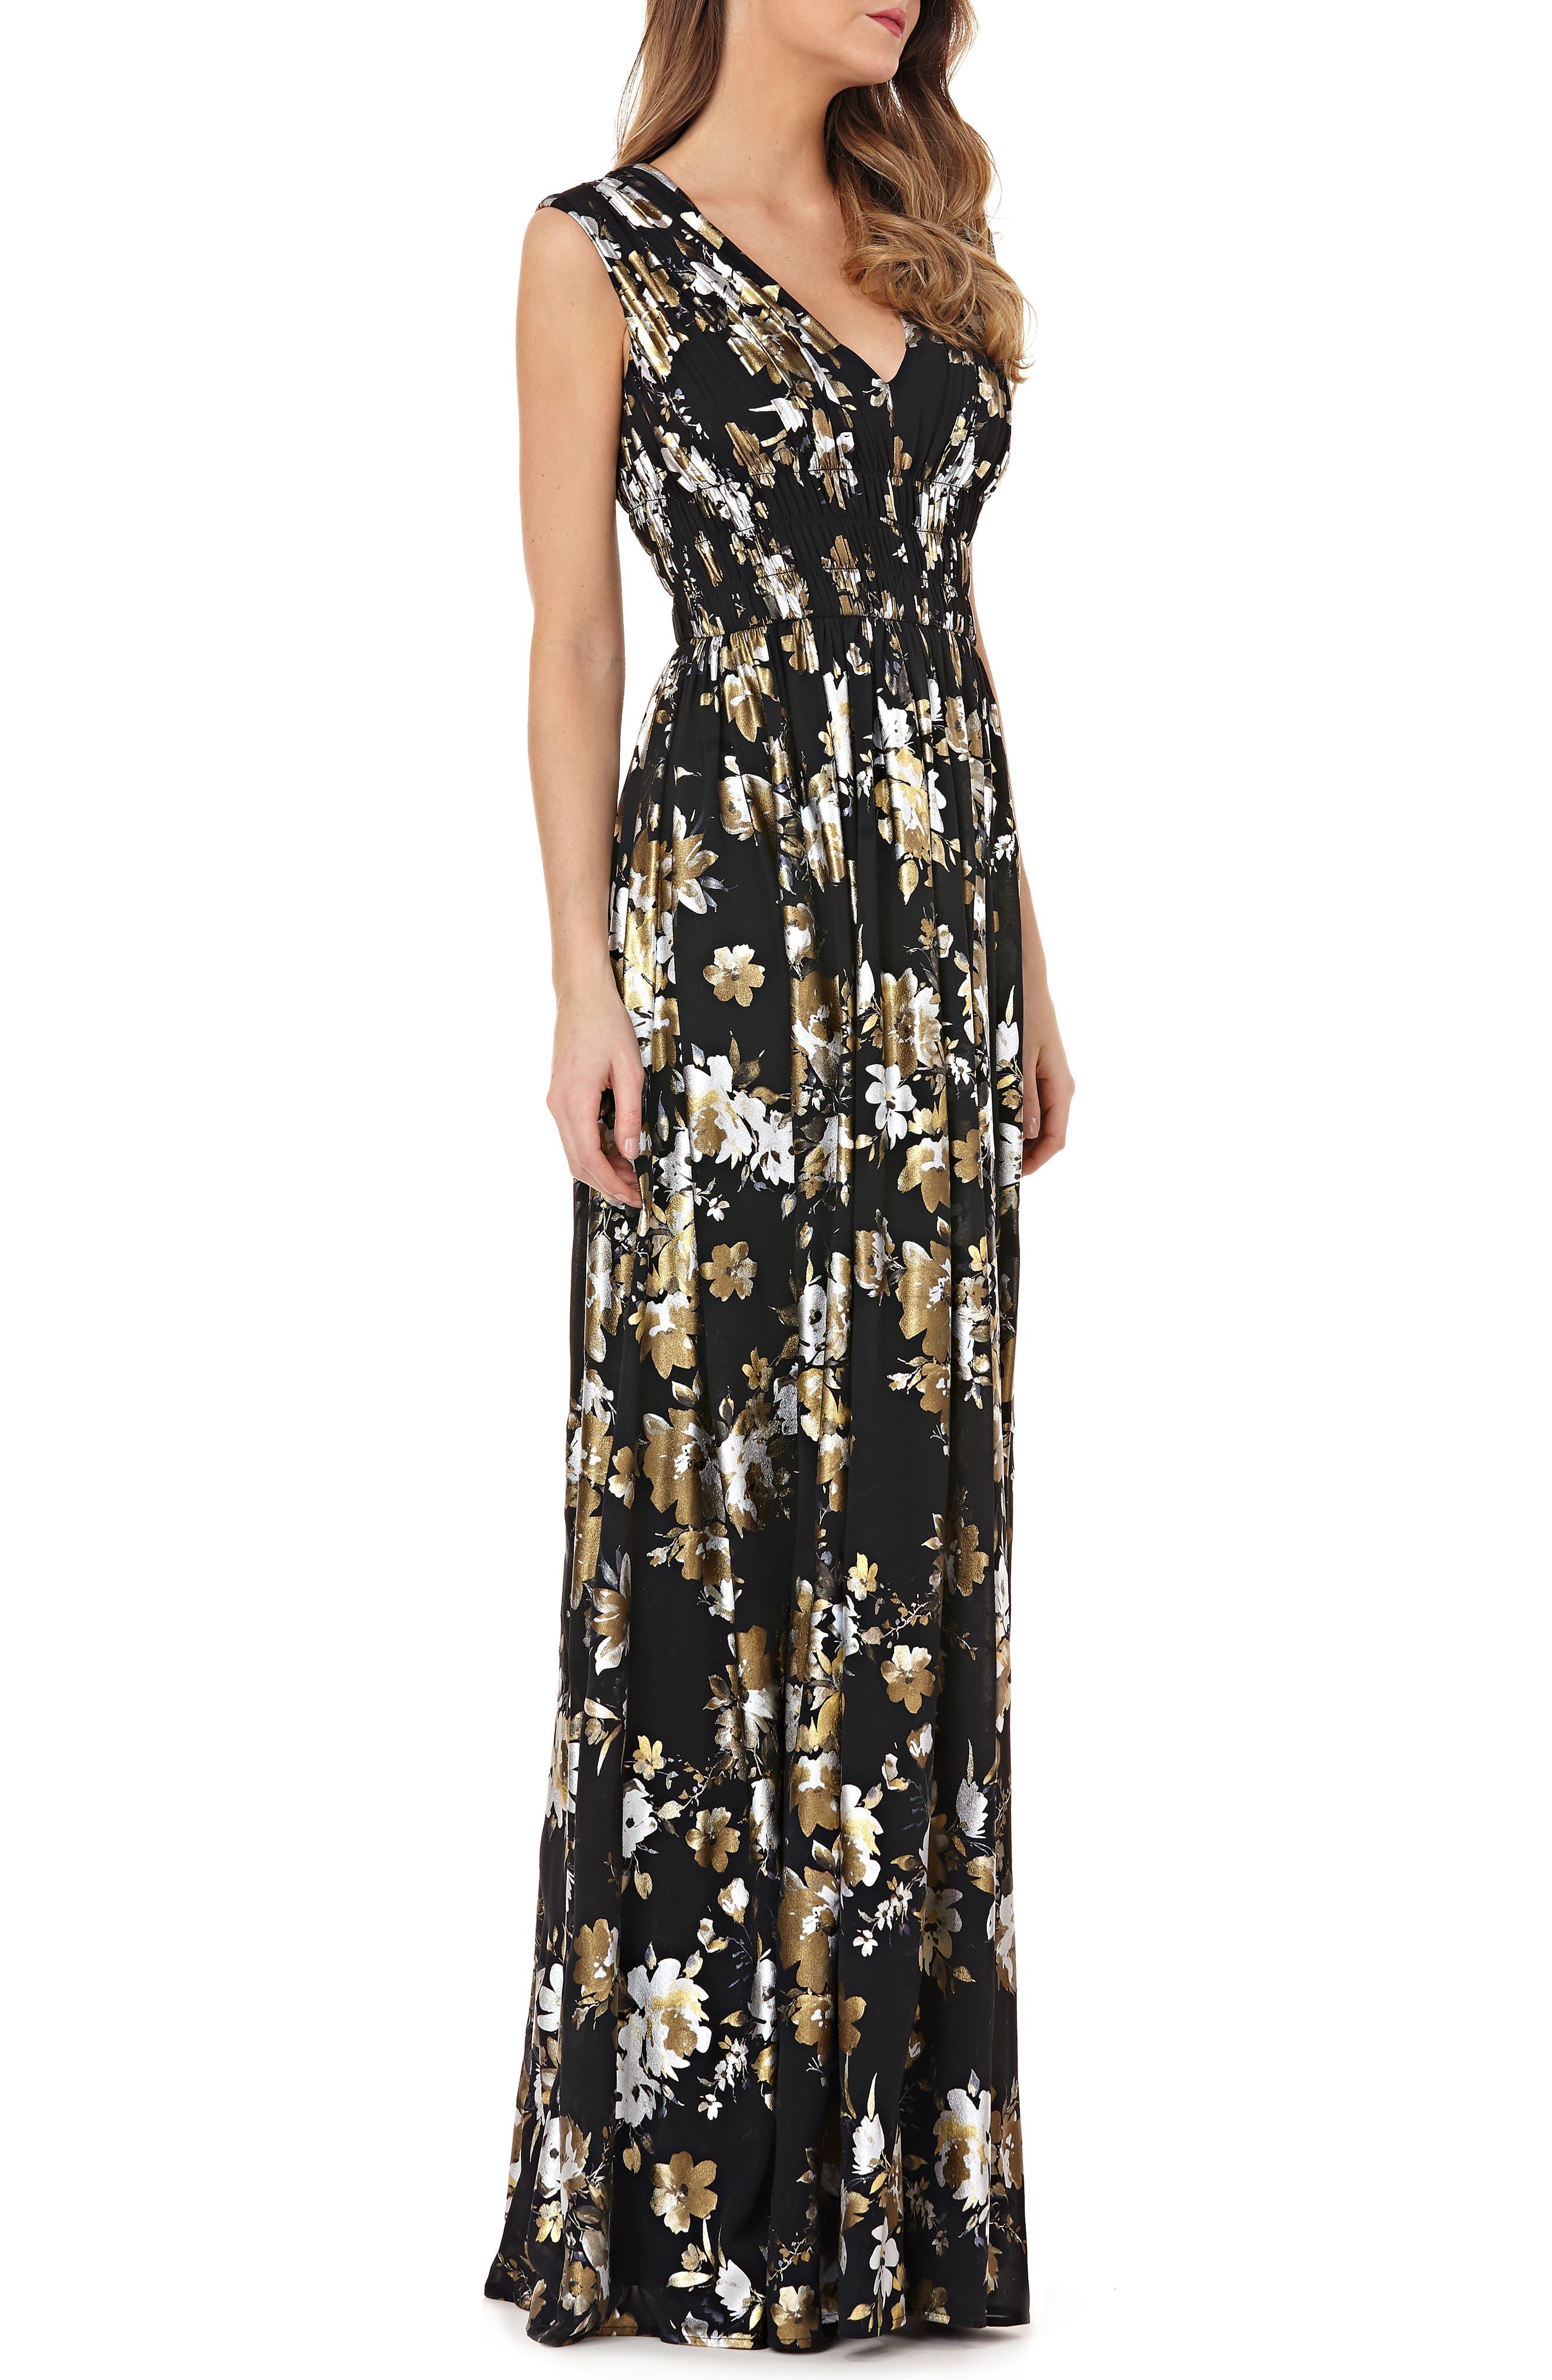 KAY UNGER V-Neck Foiled Chiffon Dress W/ Smocked Waist in Black Multi